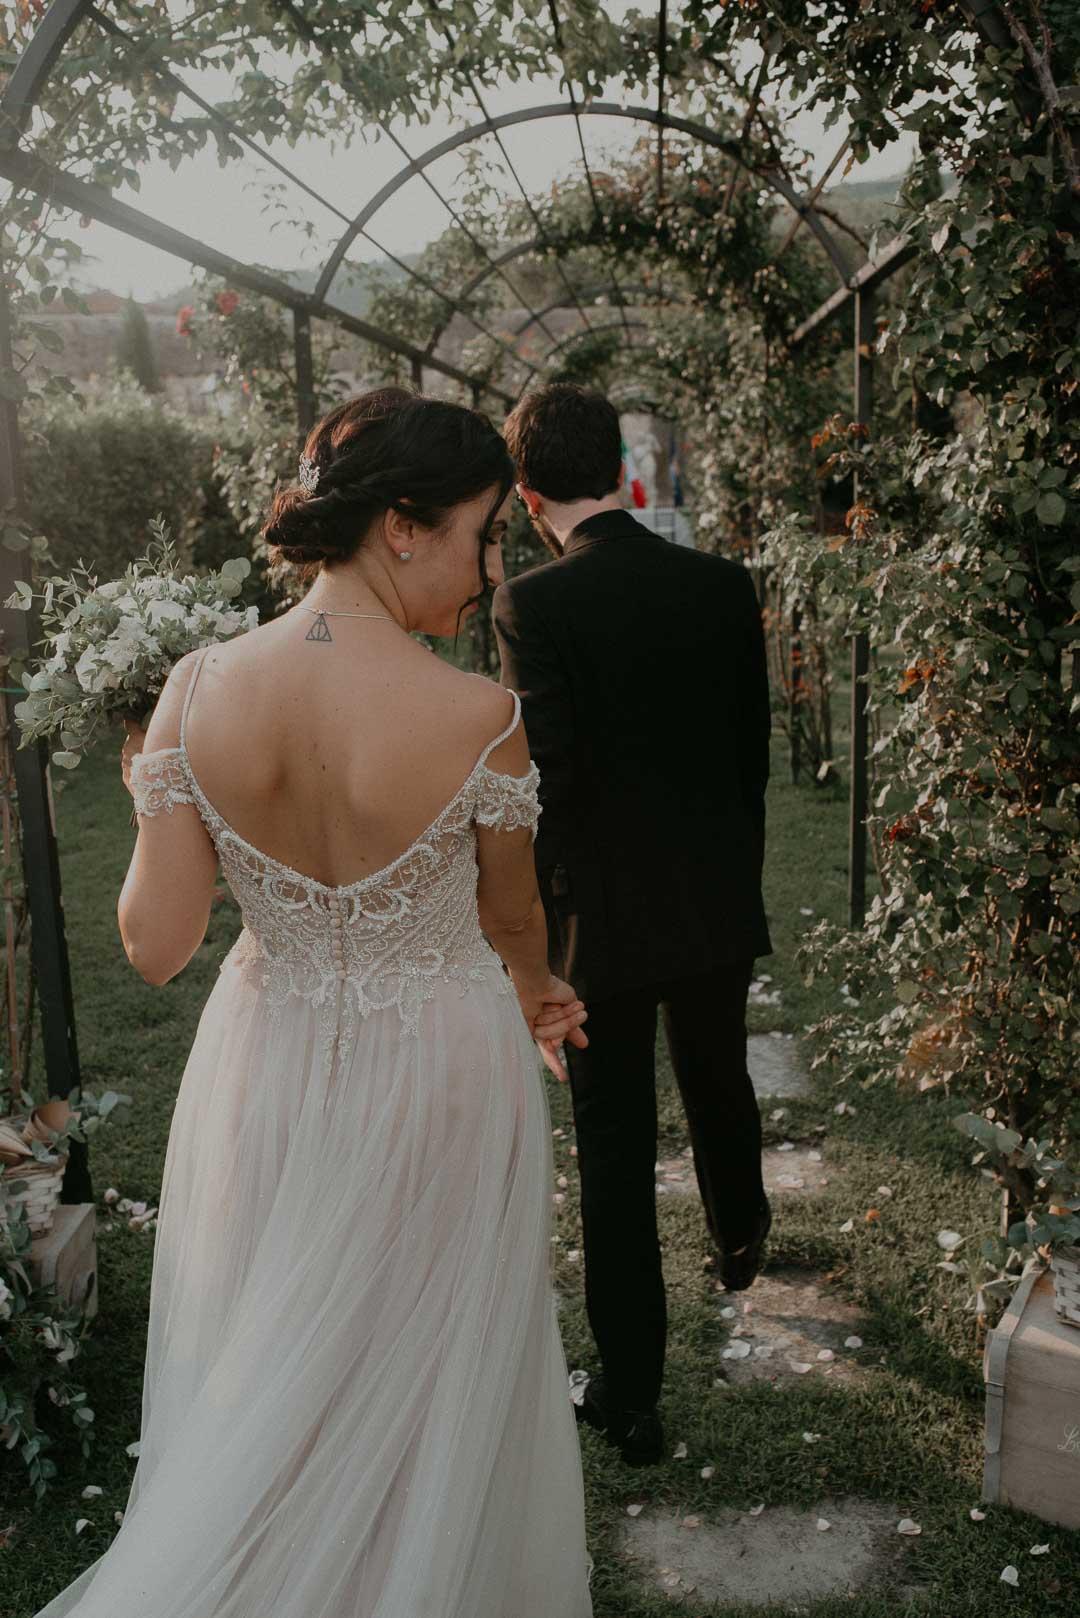 wedding-photographer-destination-fineart-bespoke-reportage-tuscany-villascorzi-vivianeizzo-spazio46-92